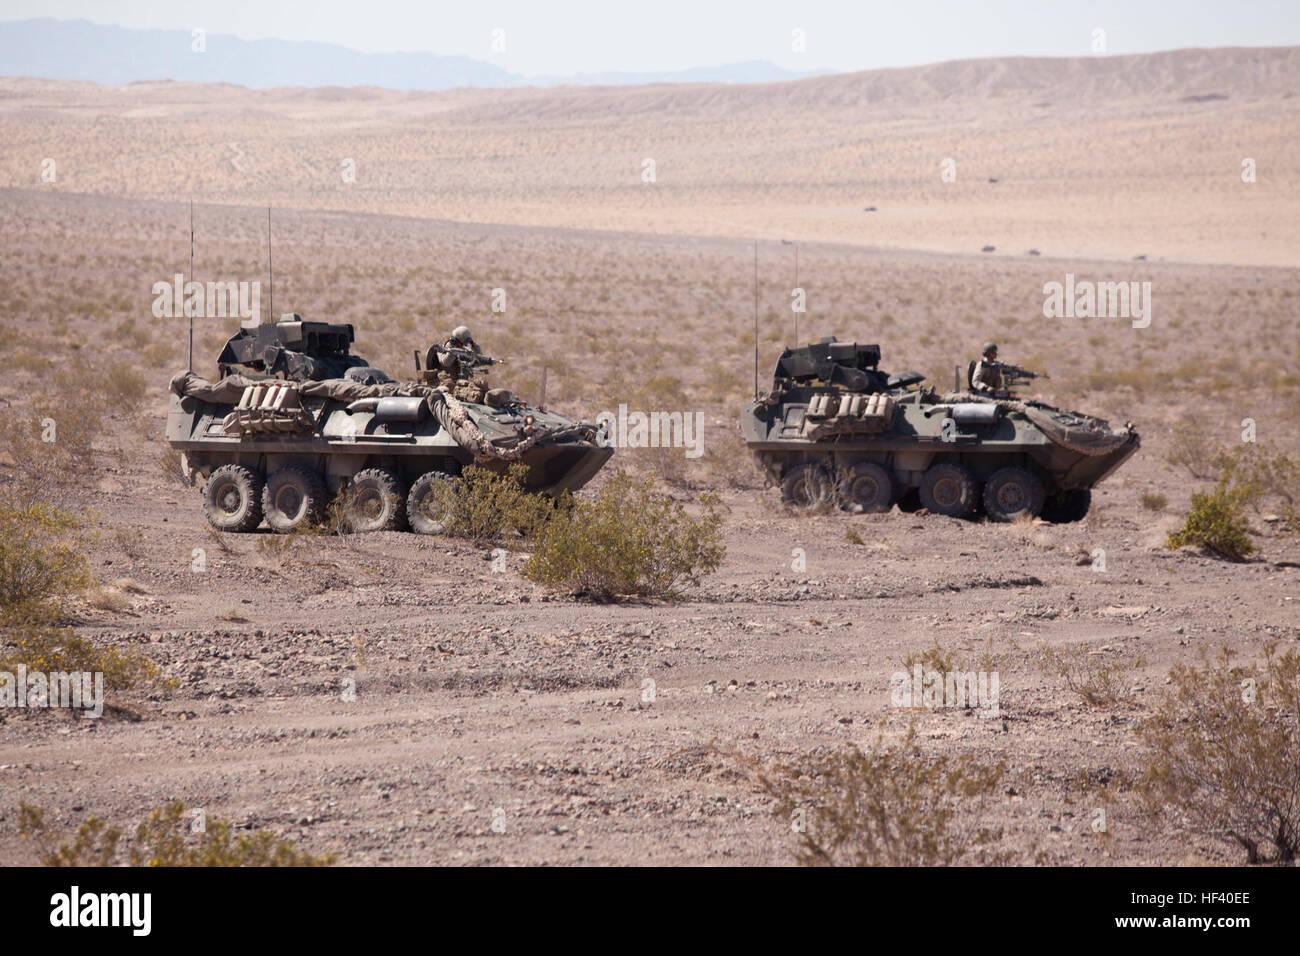 2nd Light Armored Reconnaissance Battalion